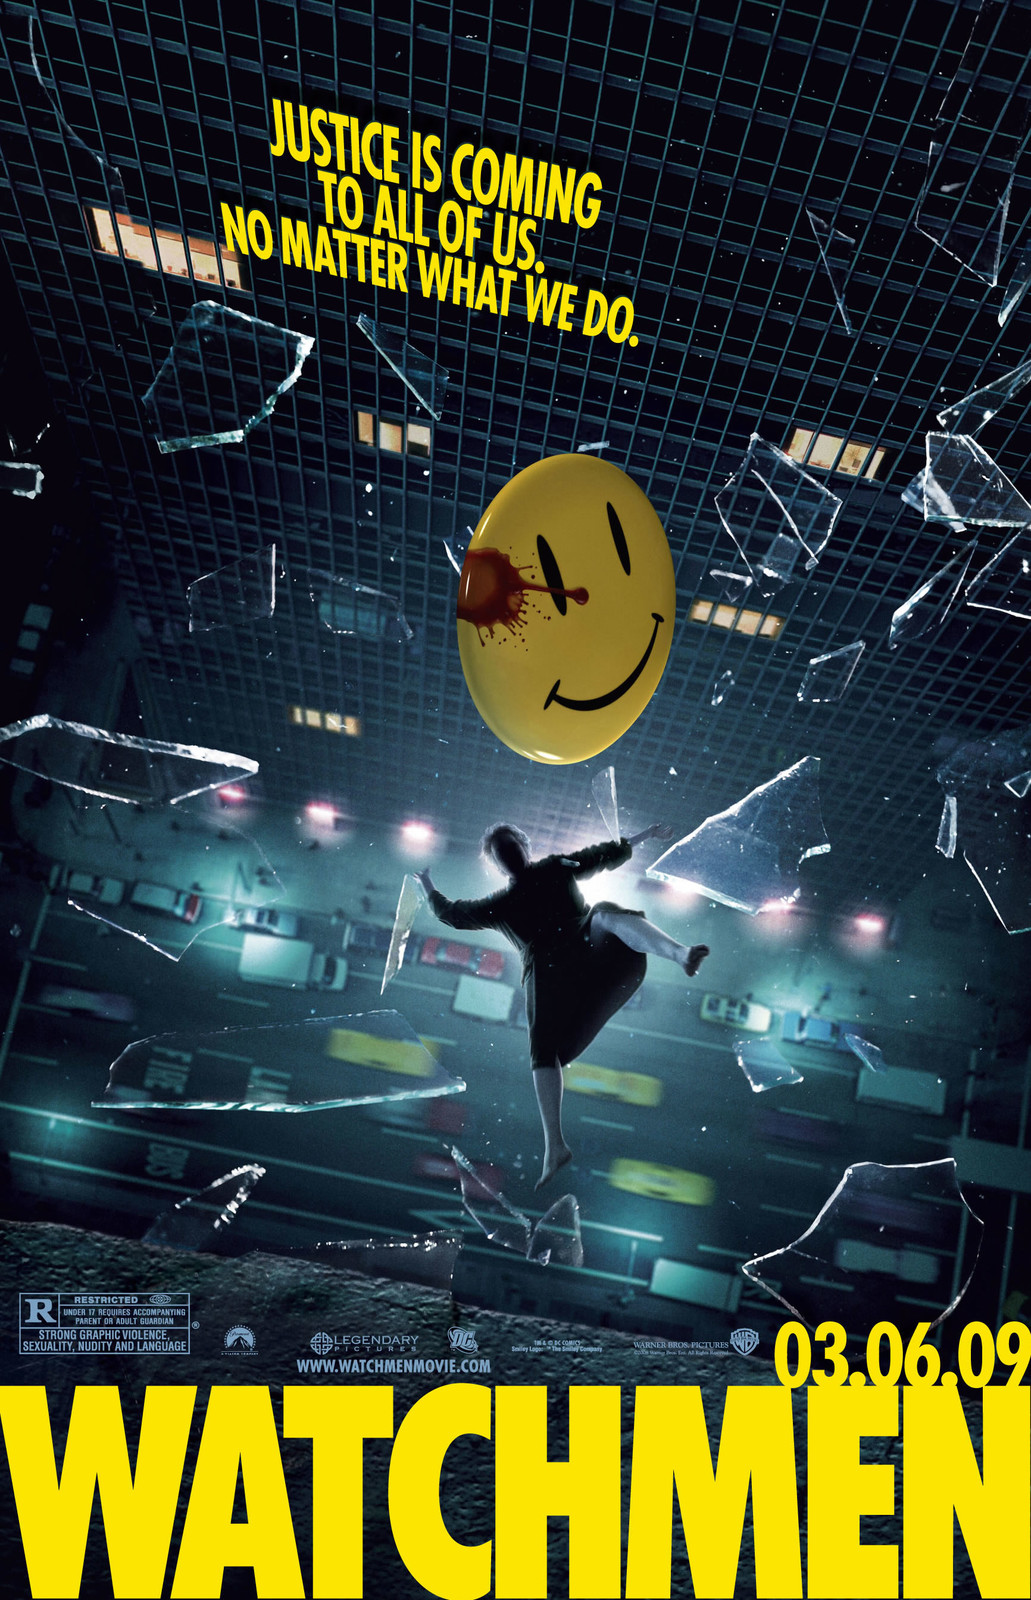 Original Watchmen Poster